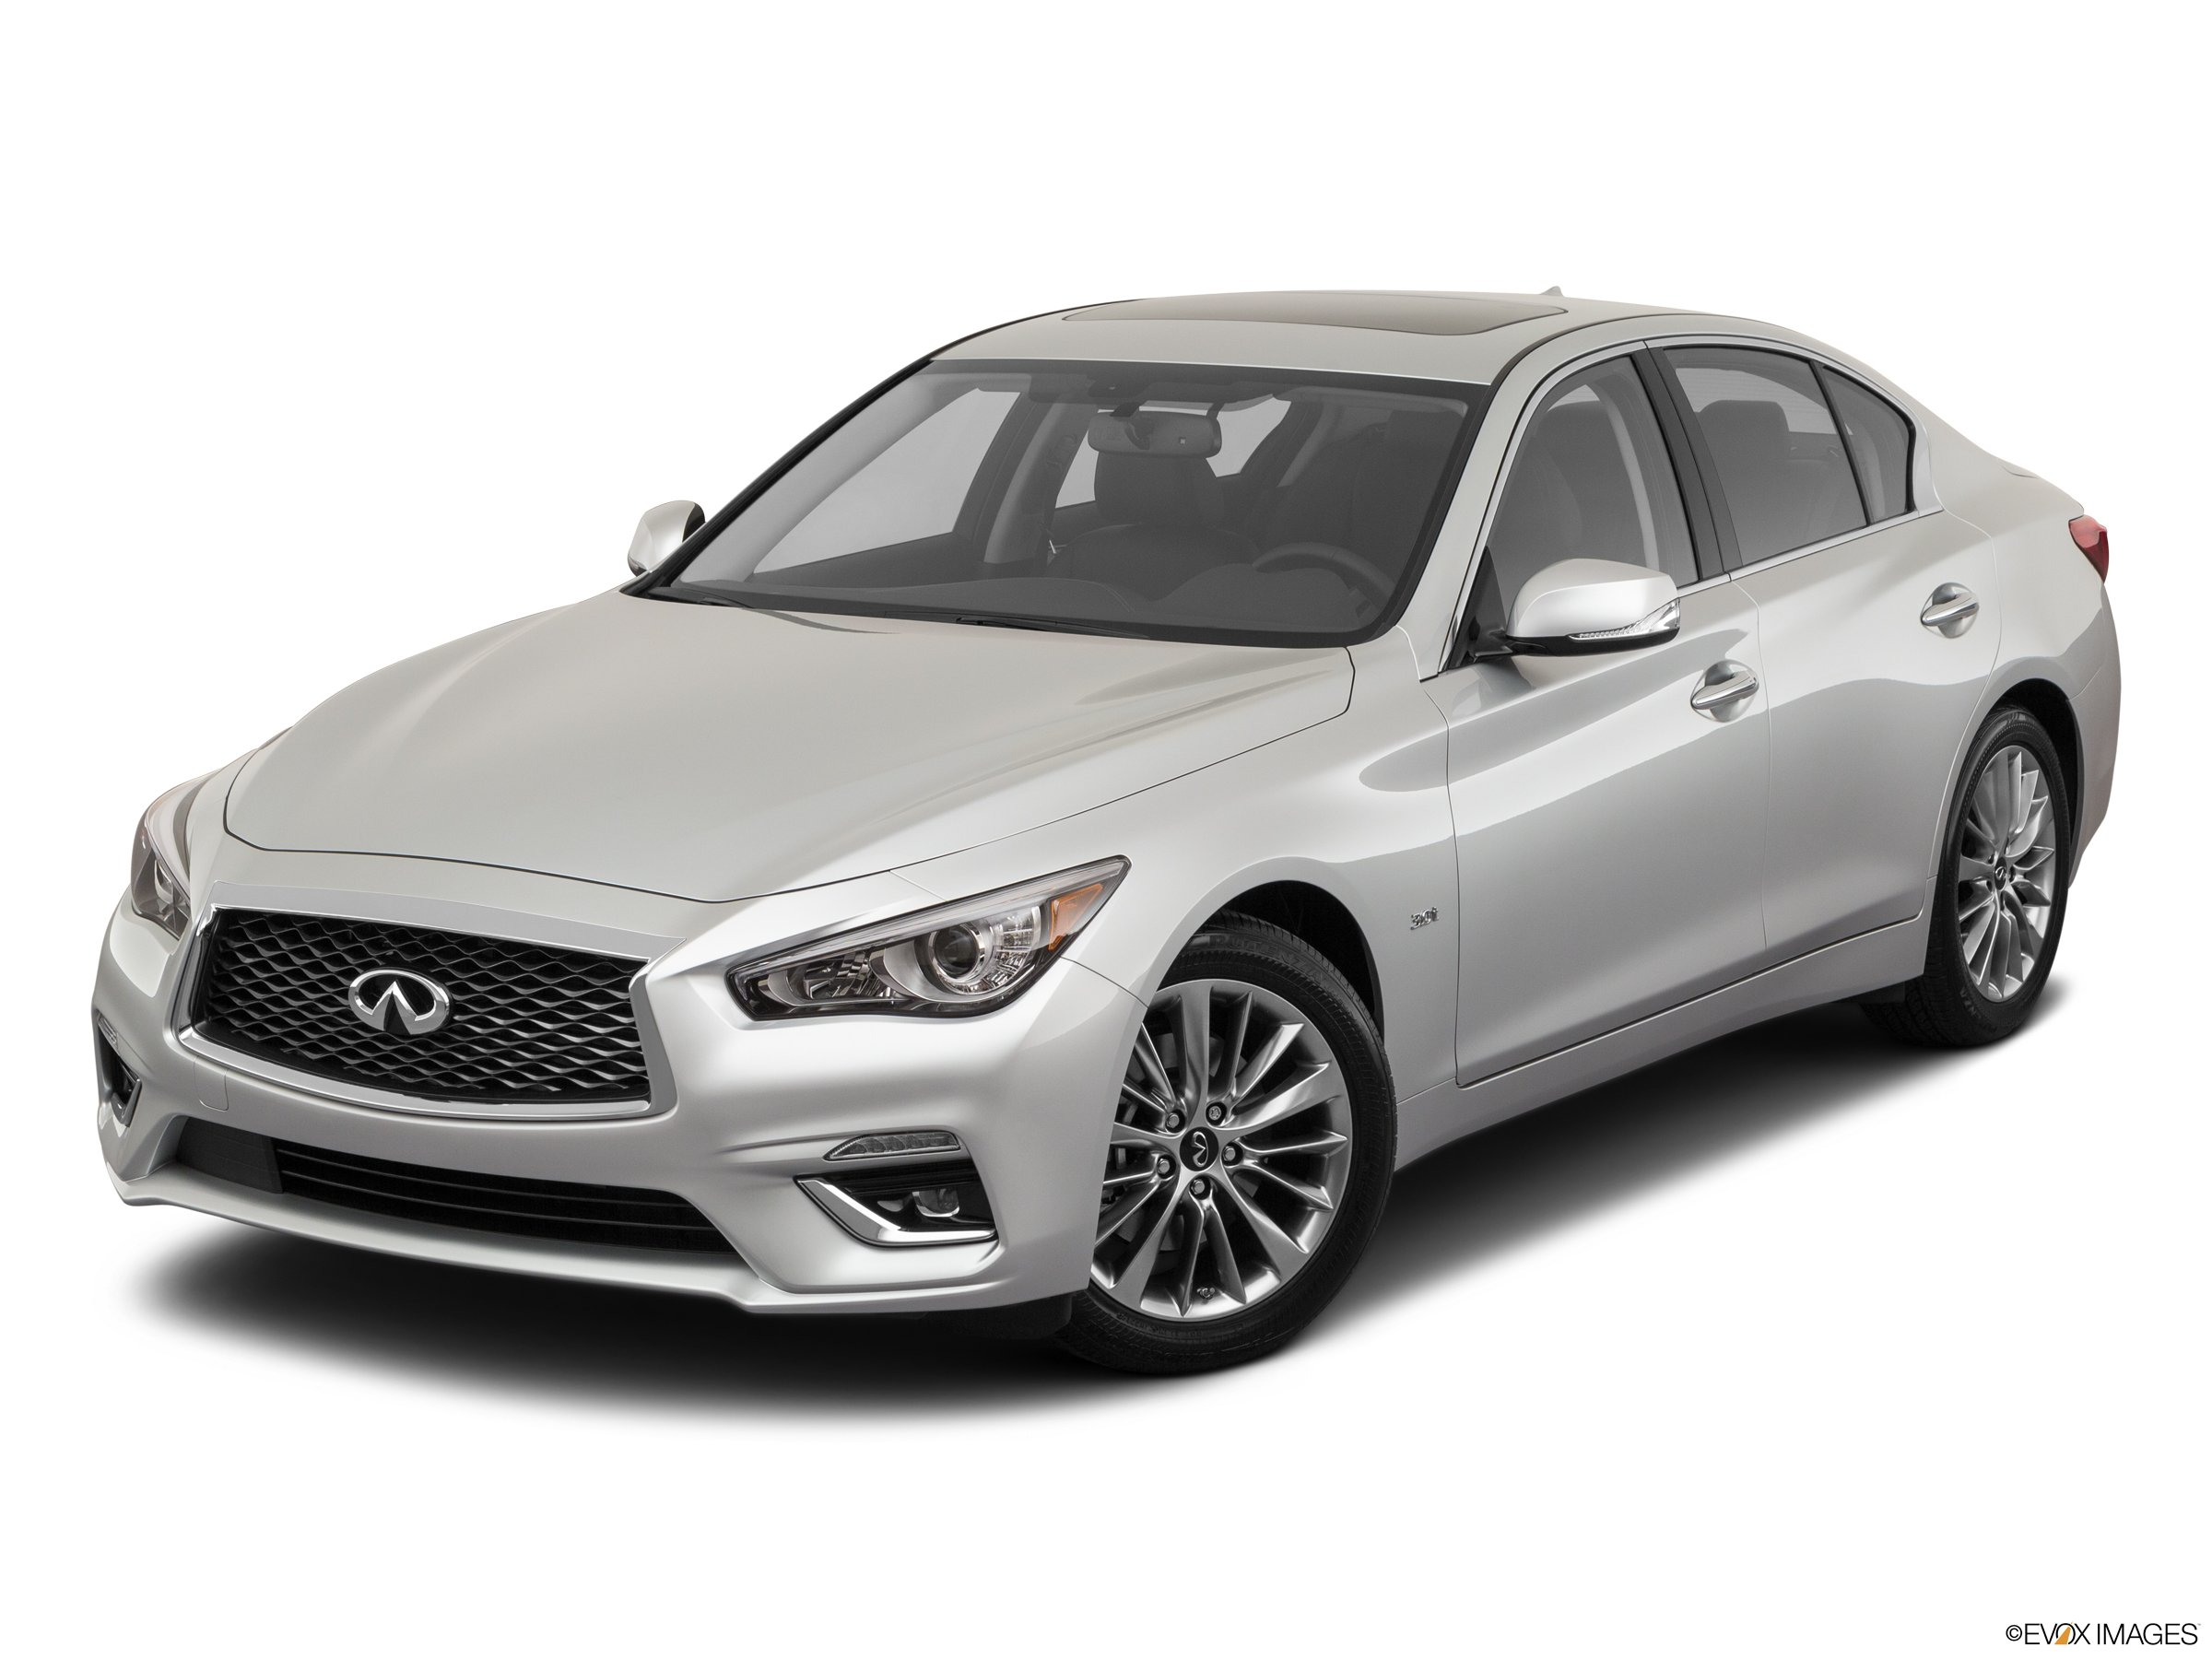 2020 Infiniti Q50 3.0t LUXE RWD sedan